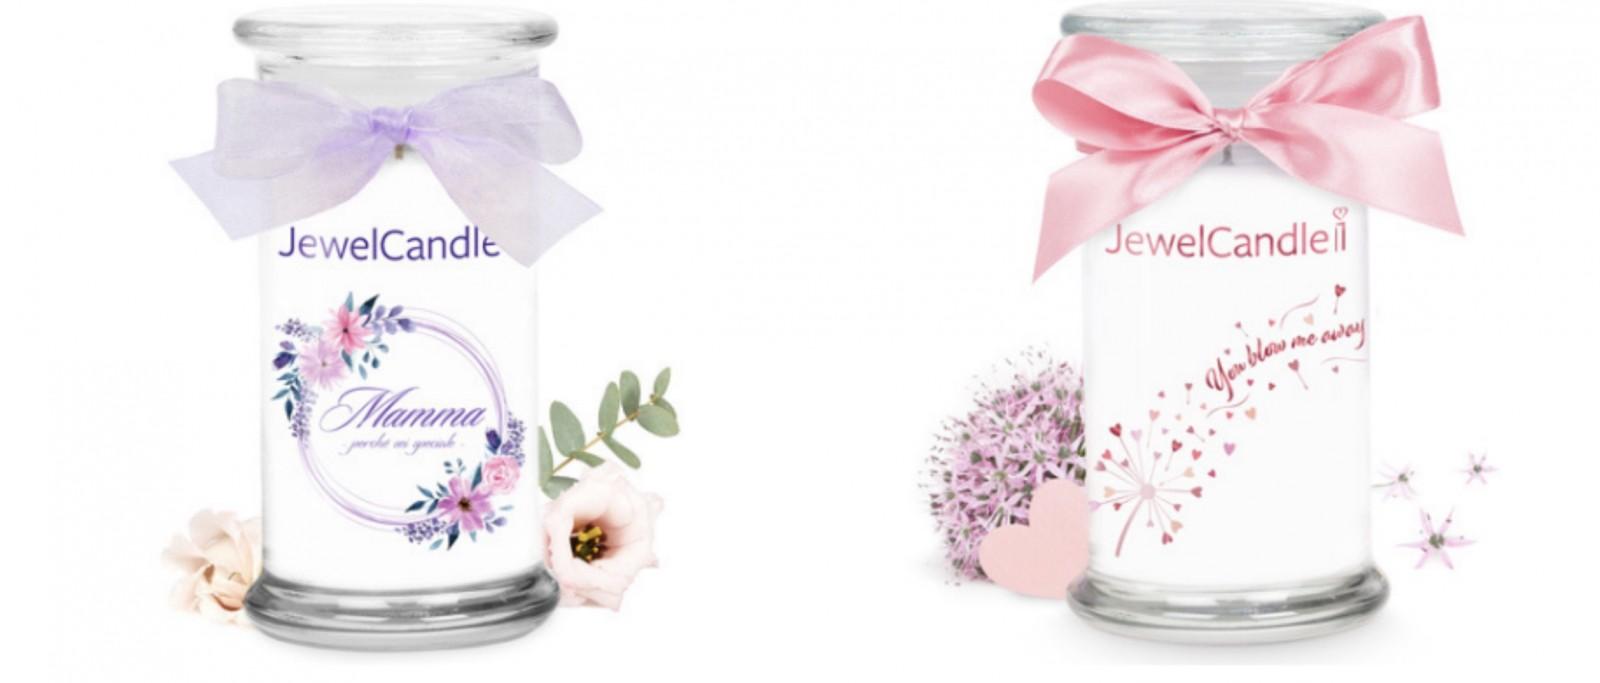 Contest vinci la Jewel Candle che preferisci